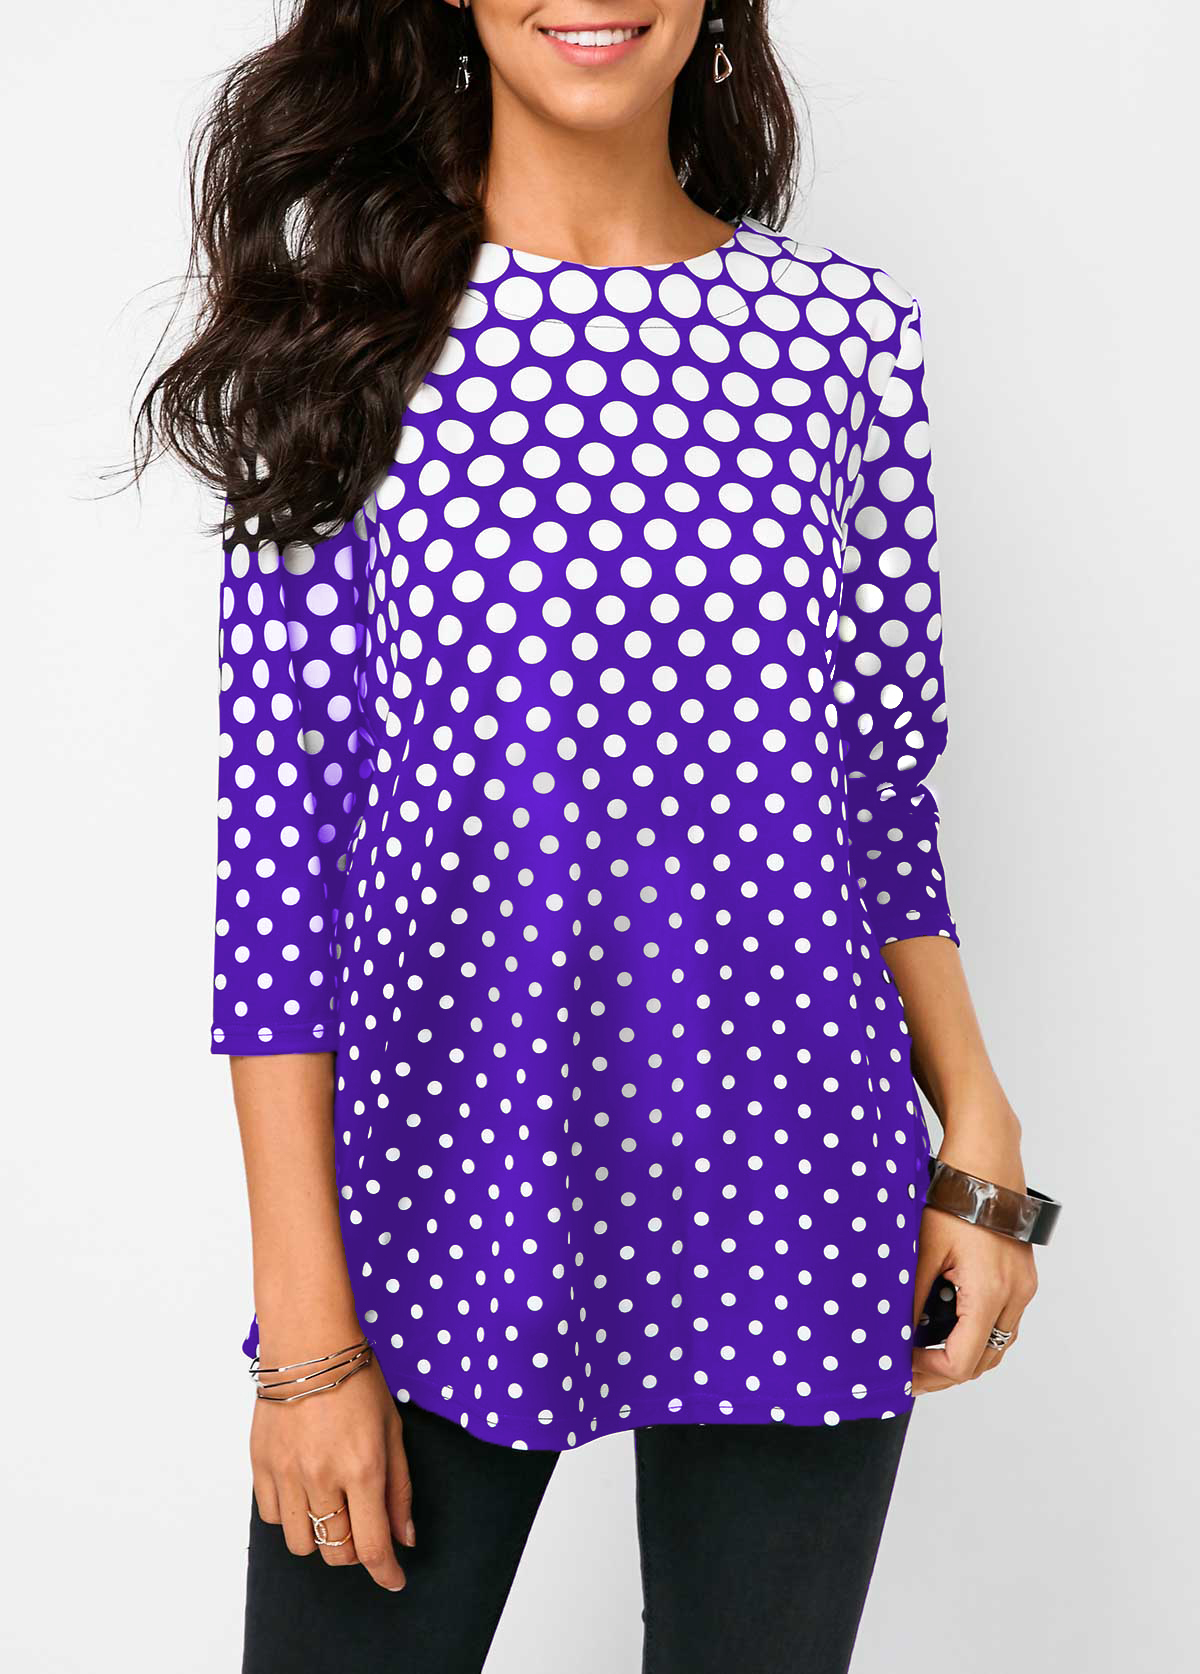 ROTITA Three Quarter Sleeve Polka Dot Purple Blouse